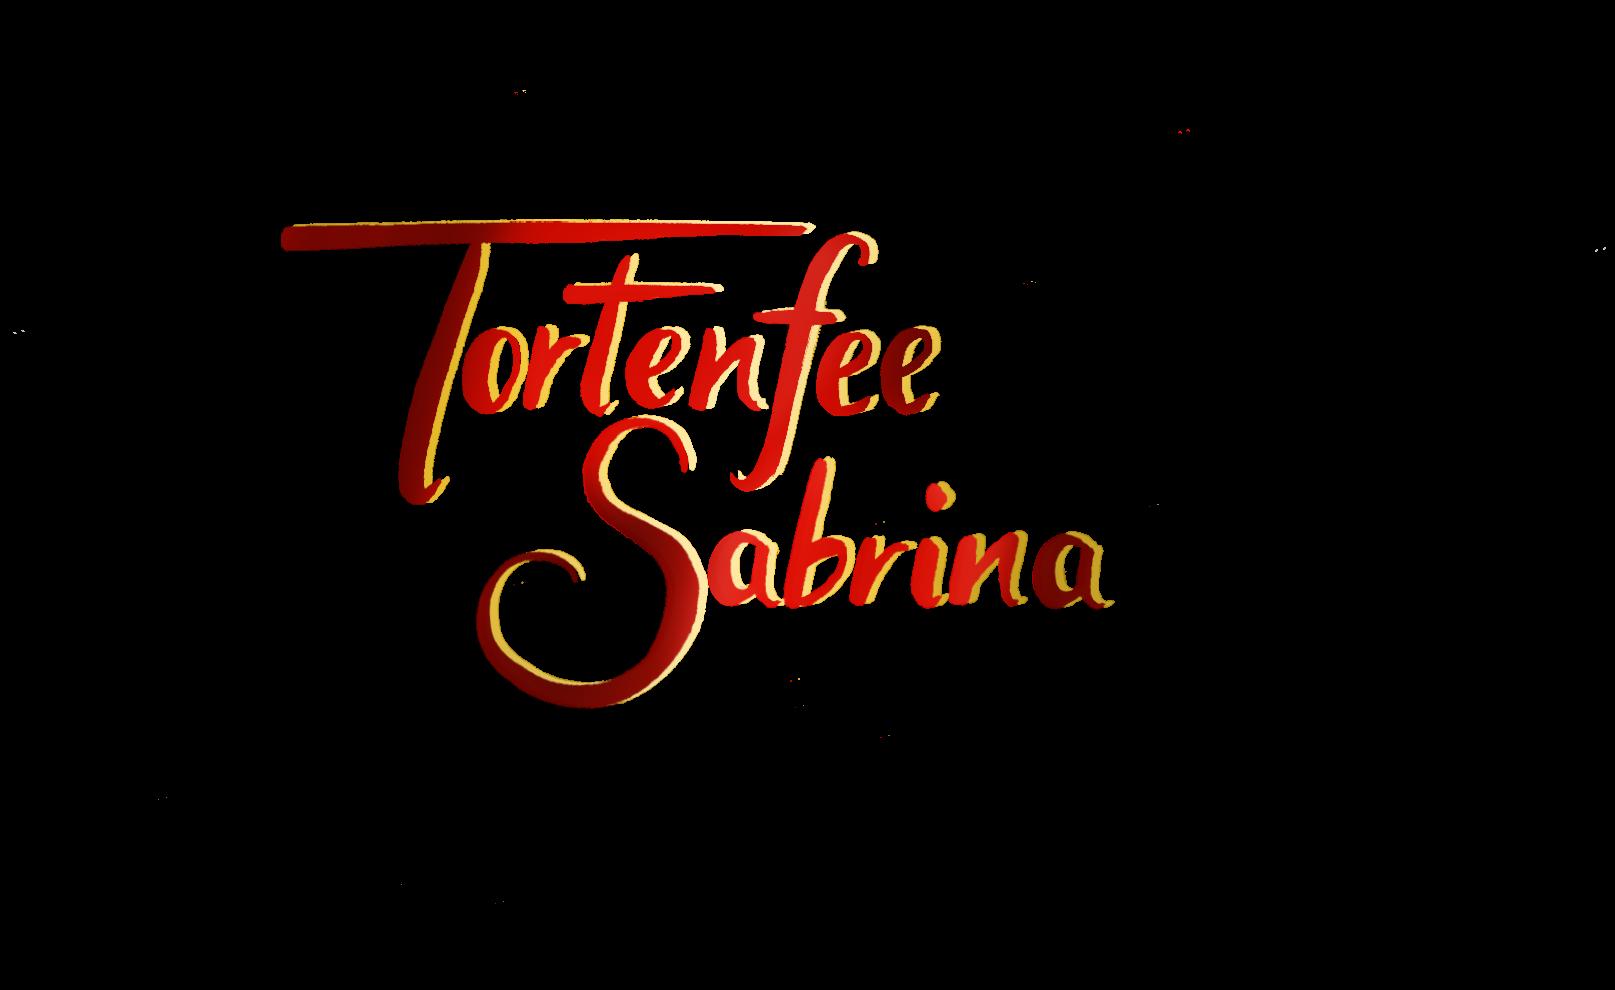 Tortenfee Sabrina